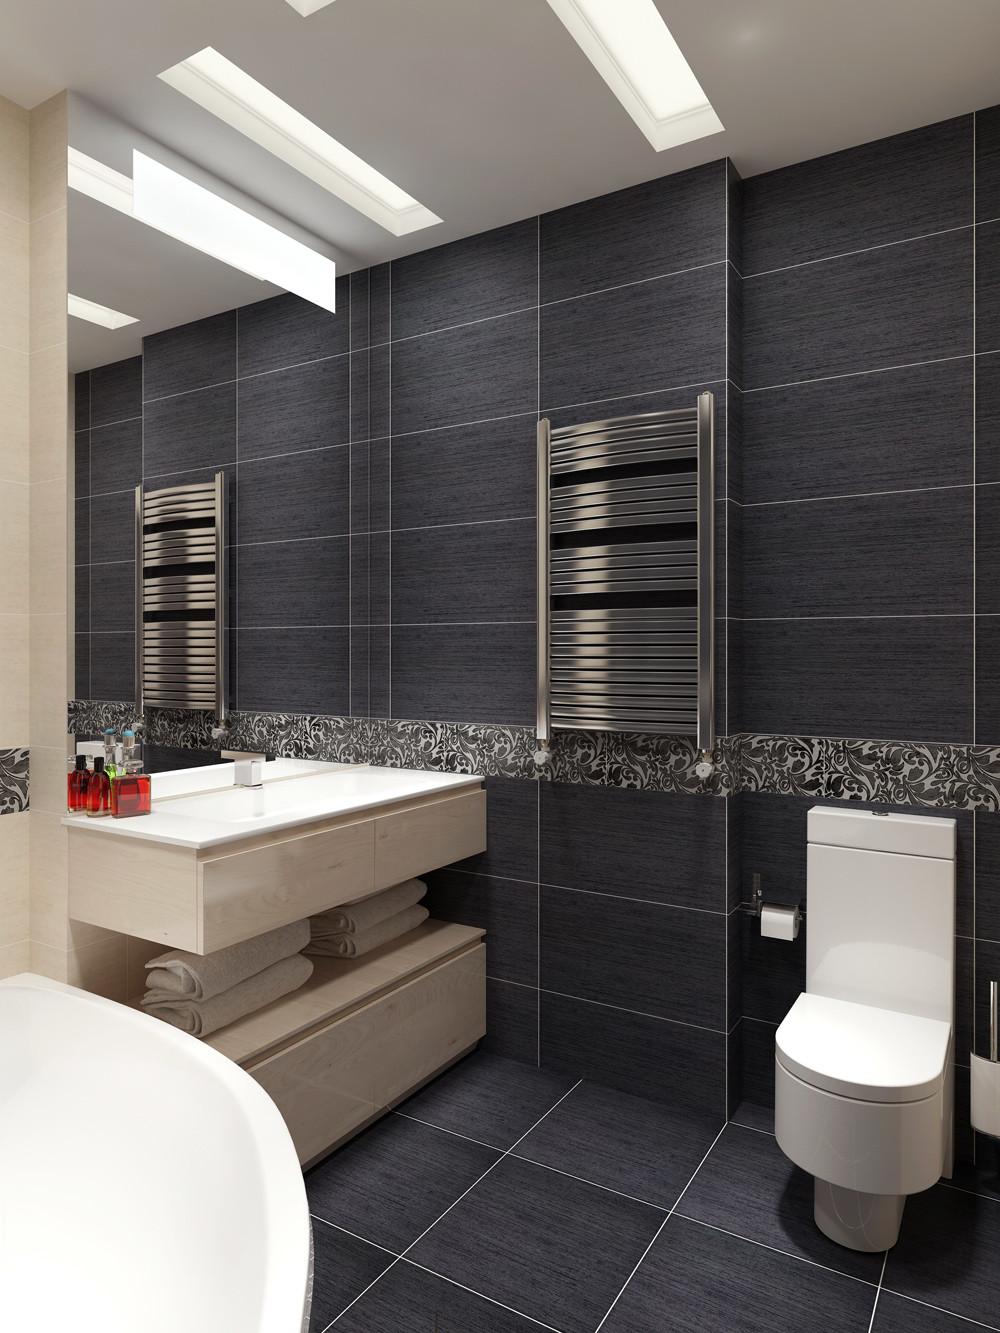 Matte Finish Bathroom Tiles